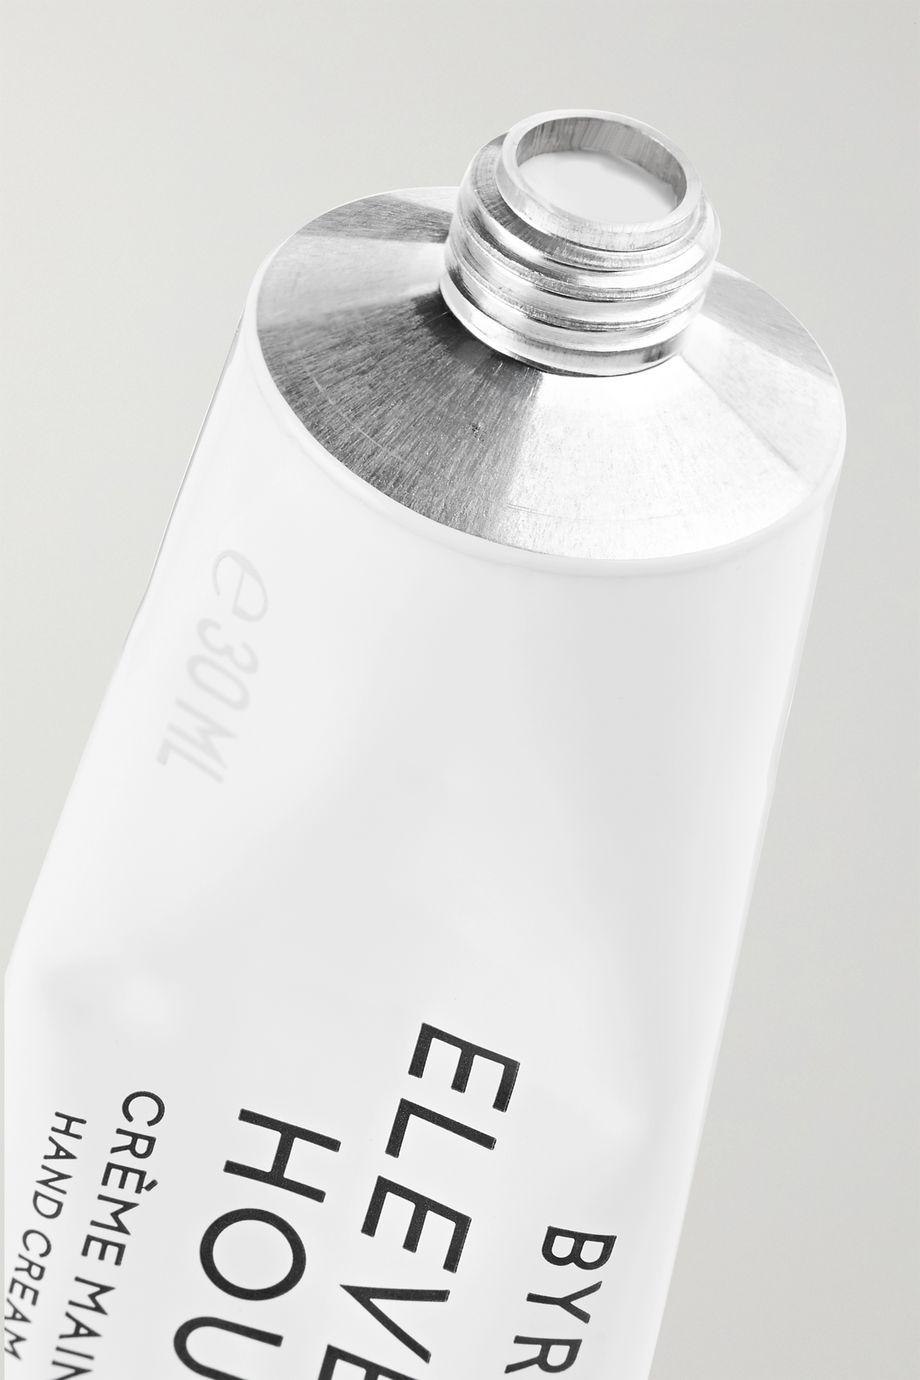 Byredo Eleventh Hour Hand Cream, 30ml